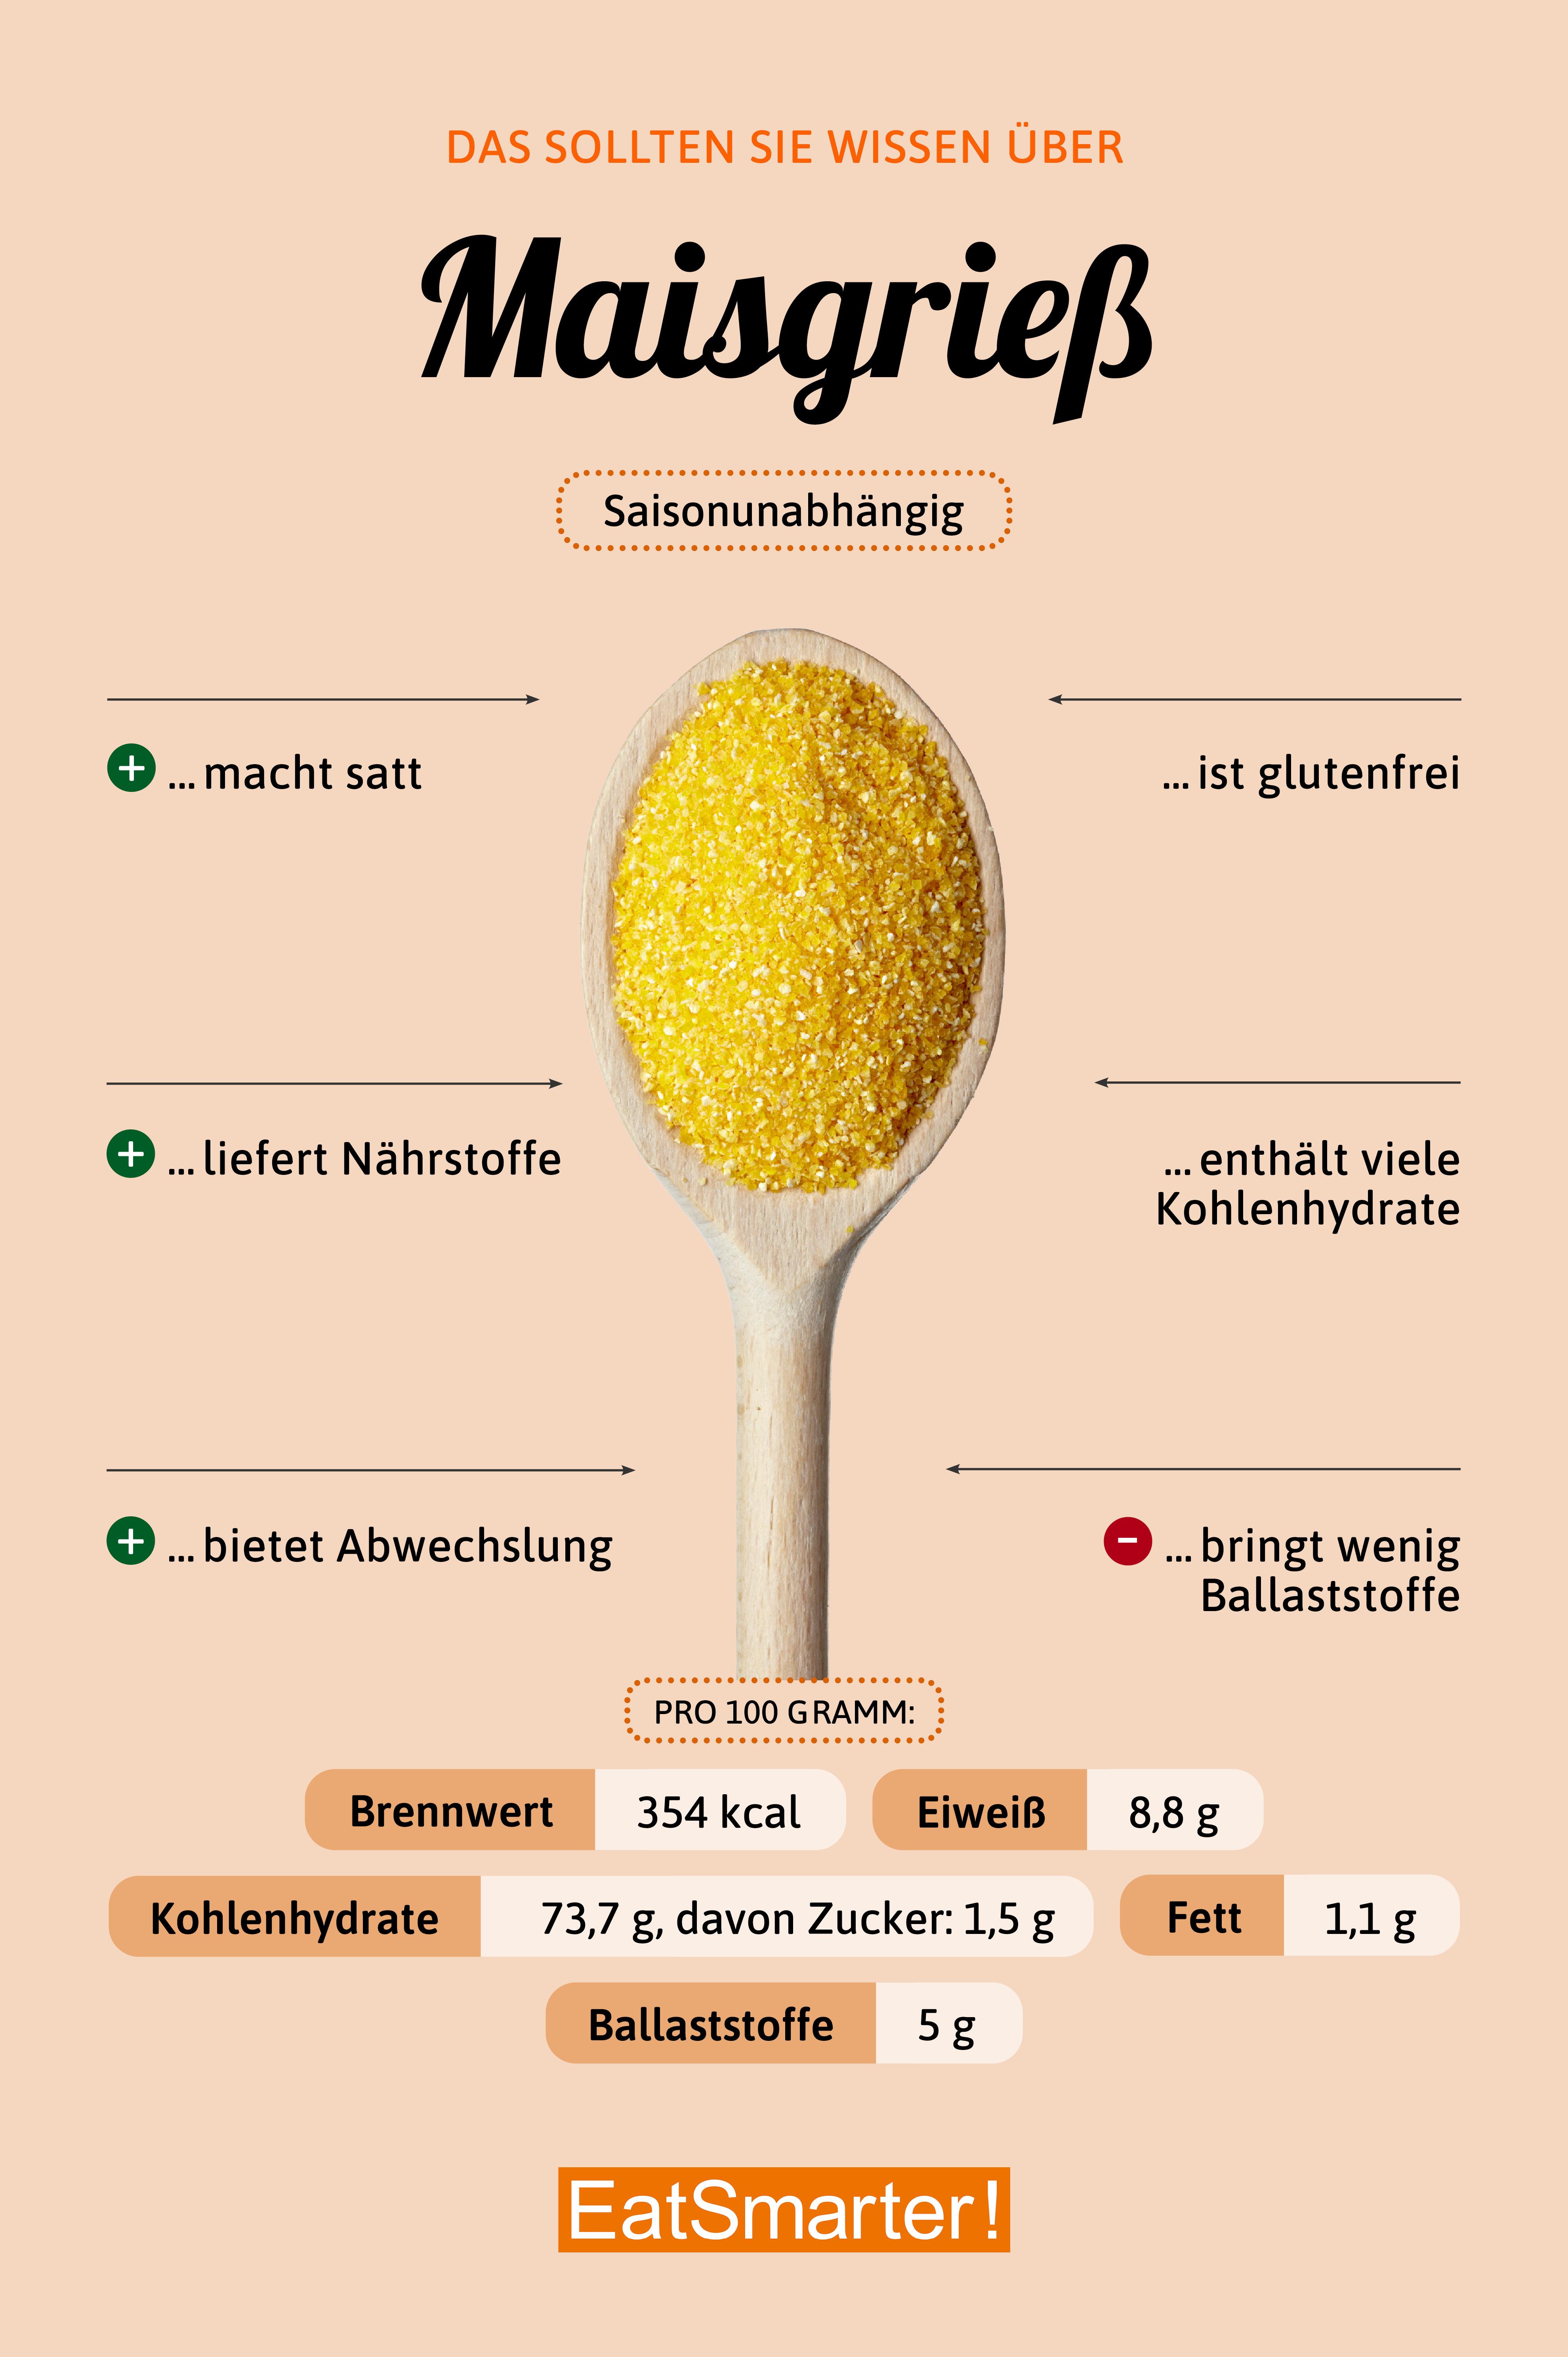 Maisgrieß